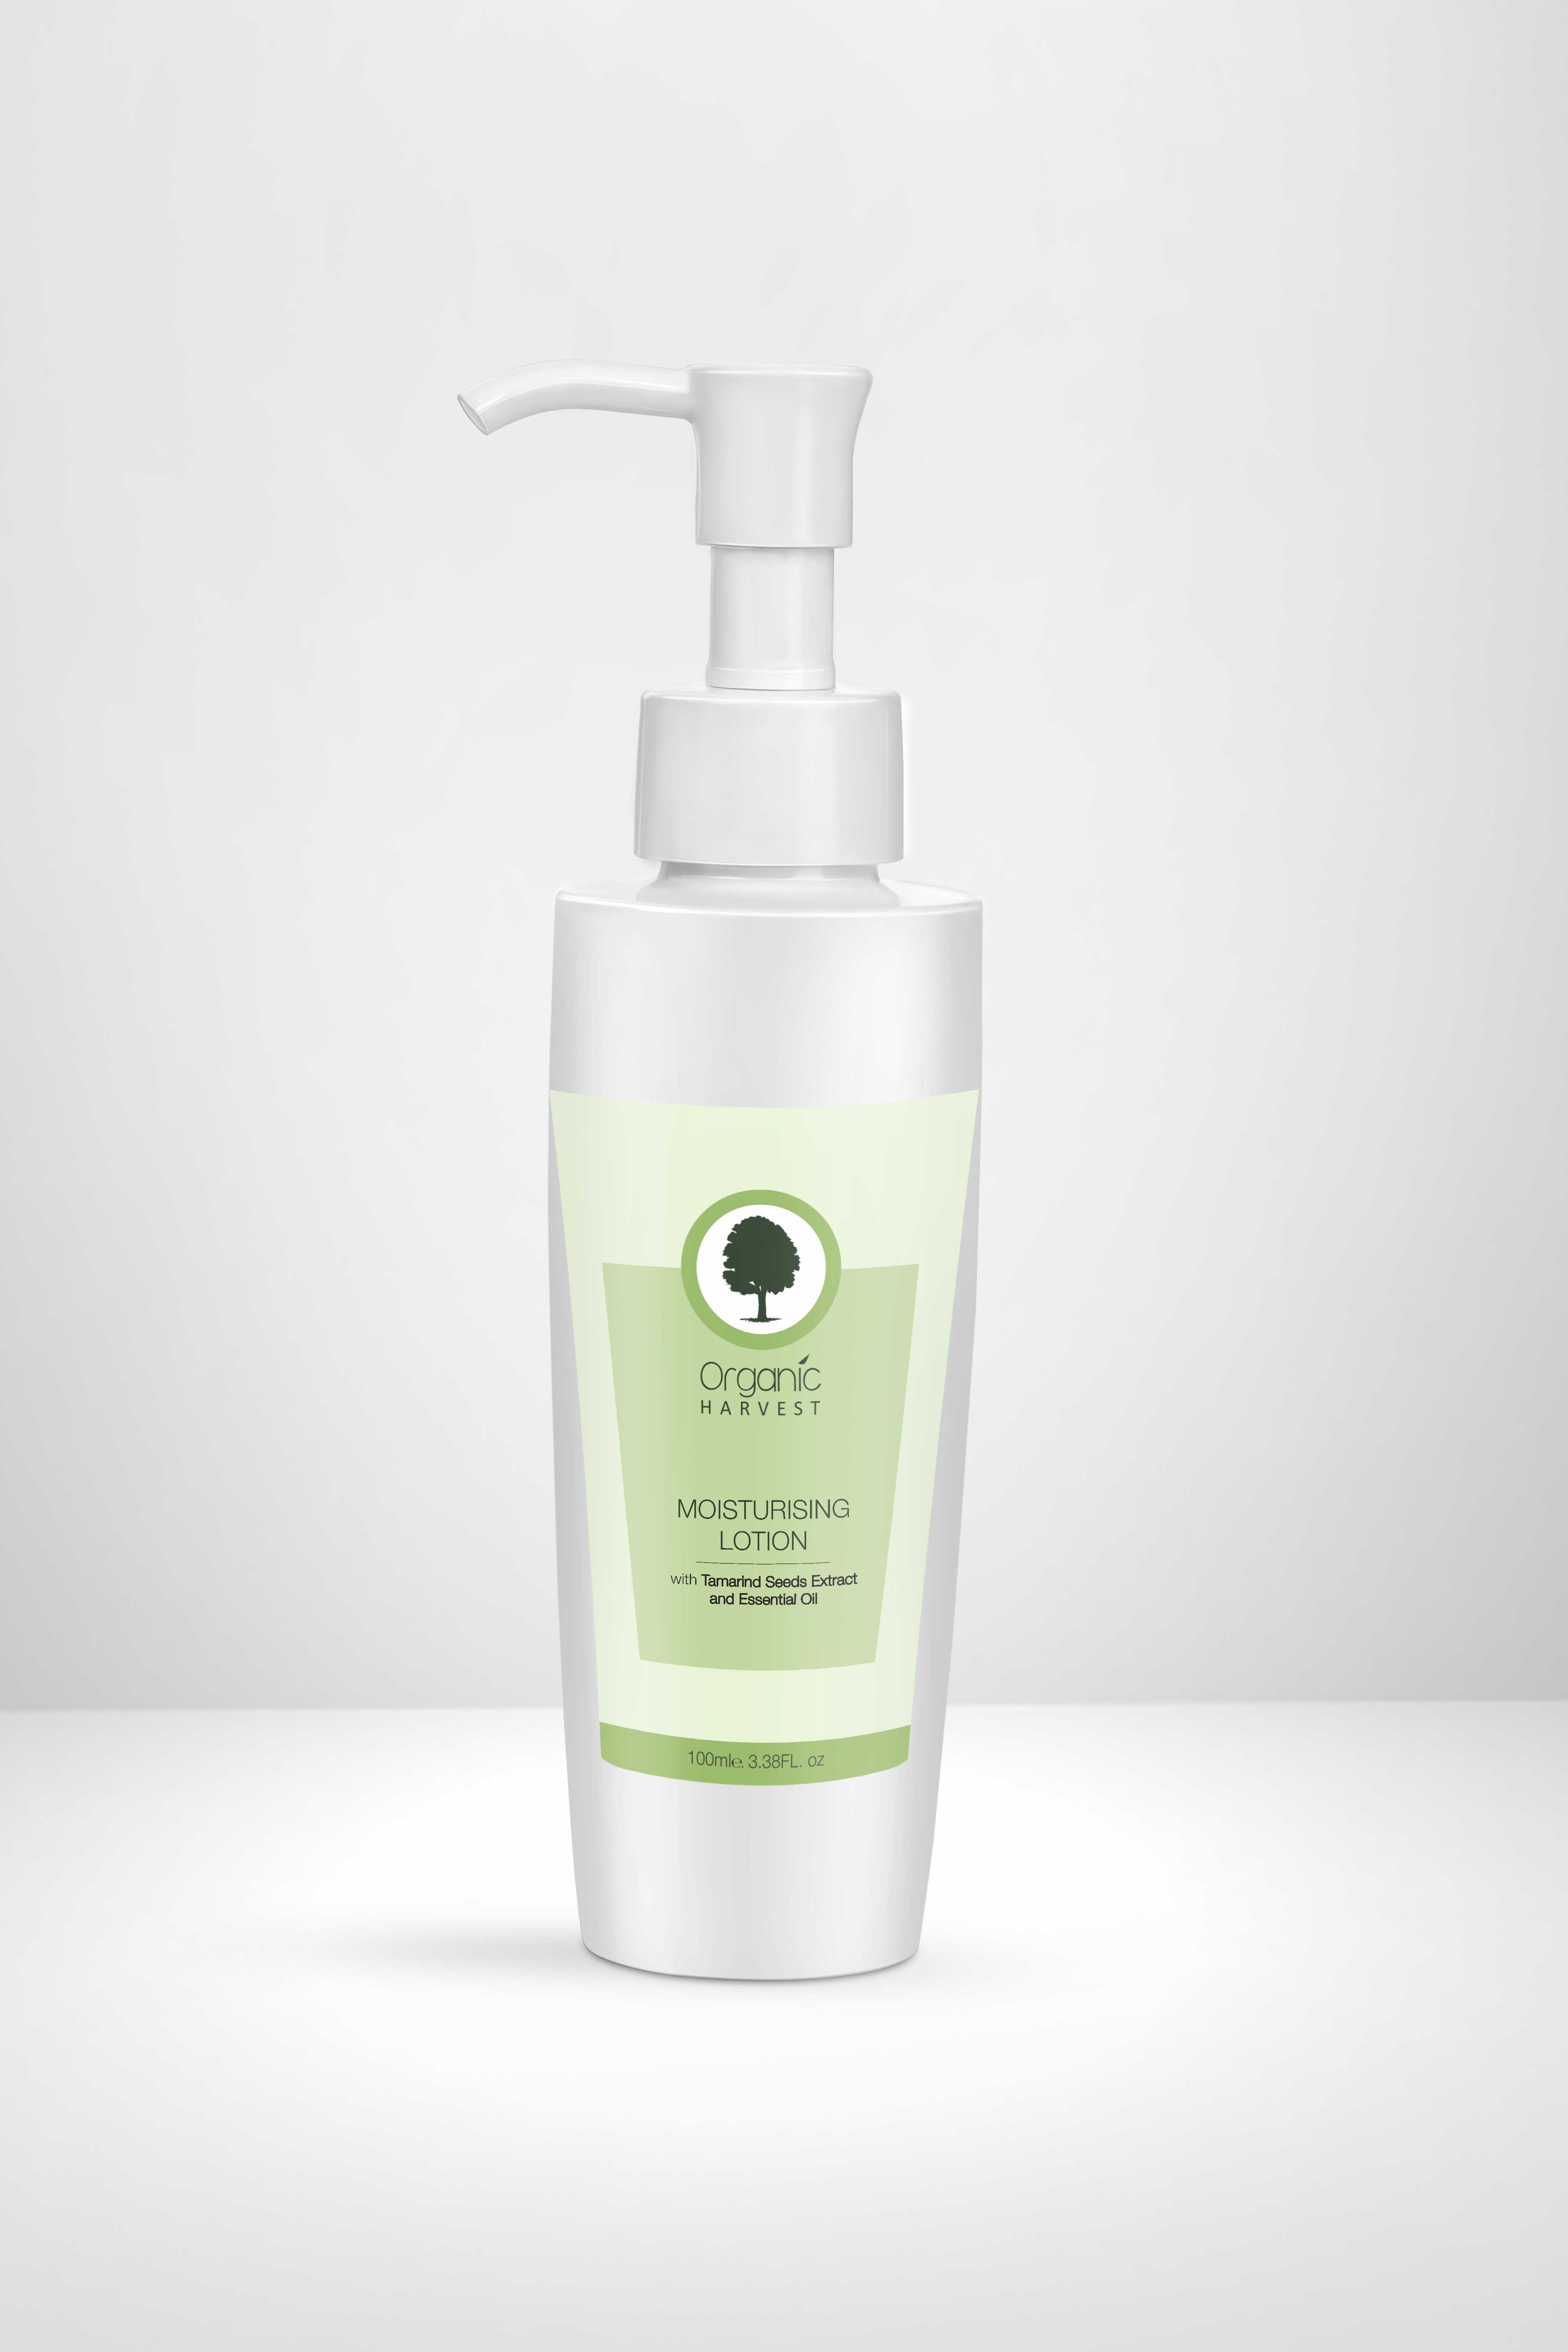 moisturising-lotion-jar